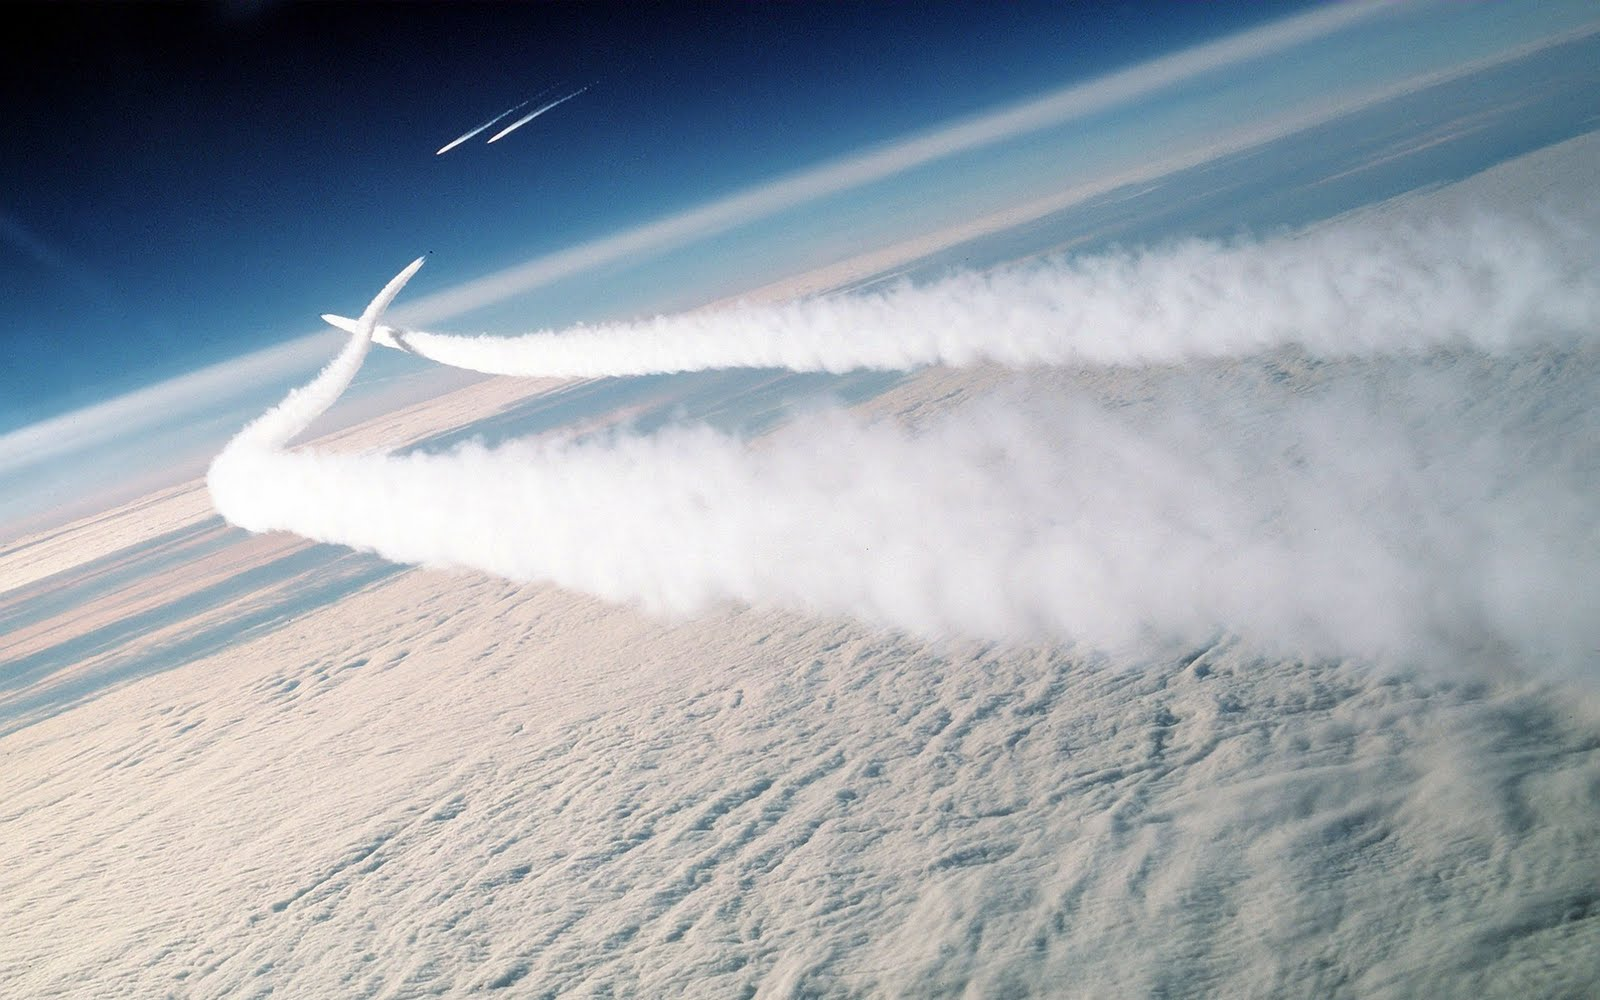 http://2.bp.blogspot.com/-08X3IcOYMAE/TkwgQOSgMnI/AAAAAAAAAAw/rK37X5wkAhQ/s1600/missile_hd-wide.jpg